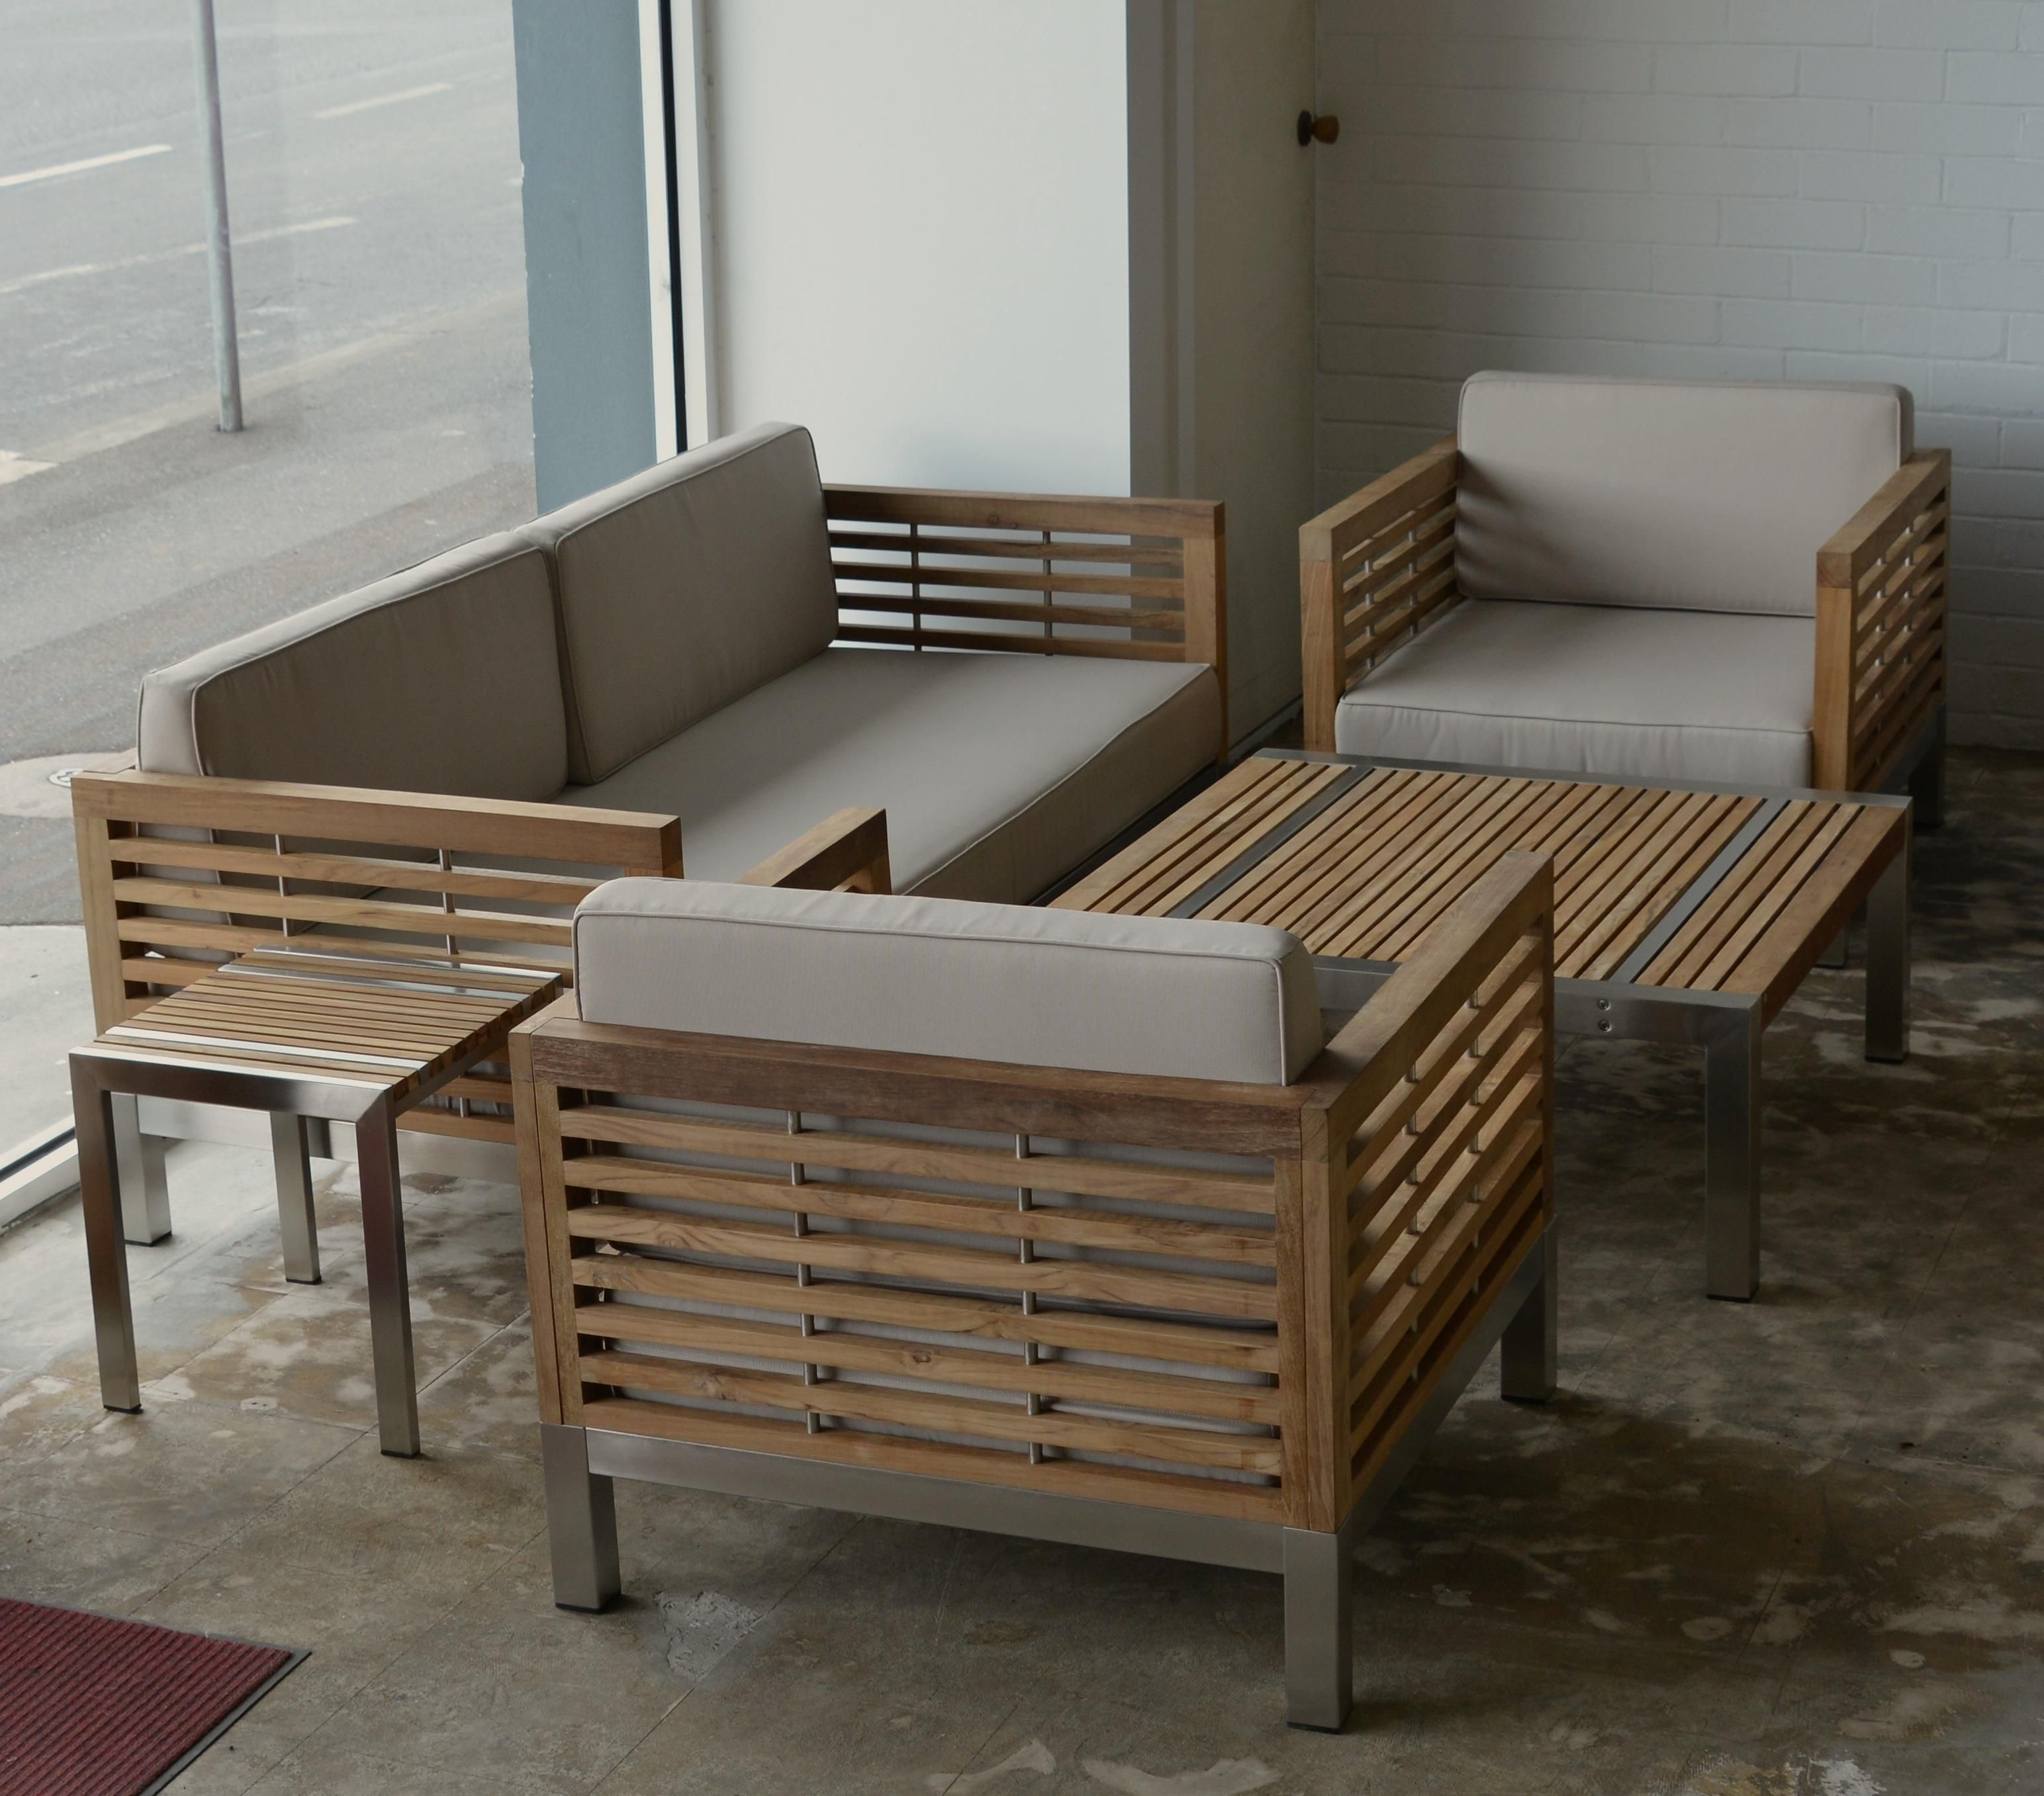 Outdoor Furniture Adelaide - Wicker & Rattan | Living ...